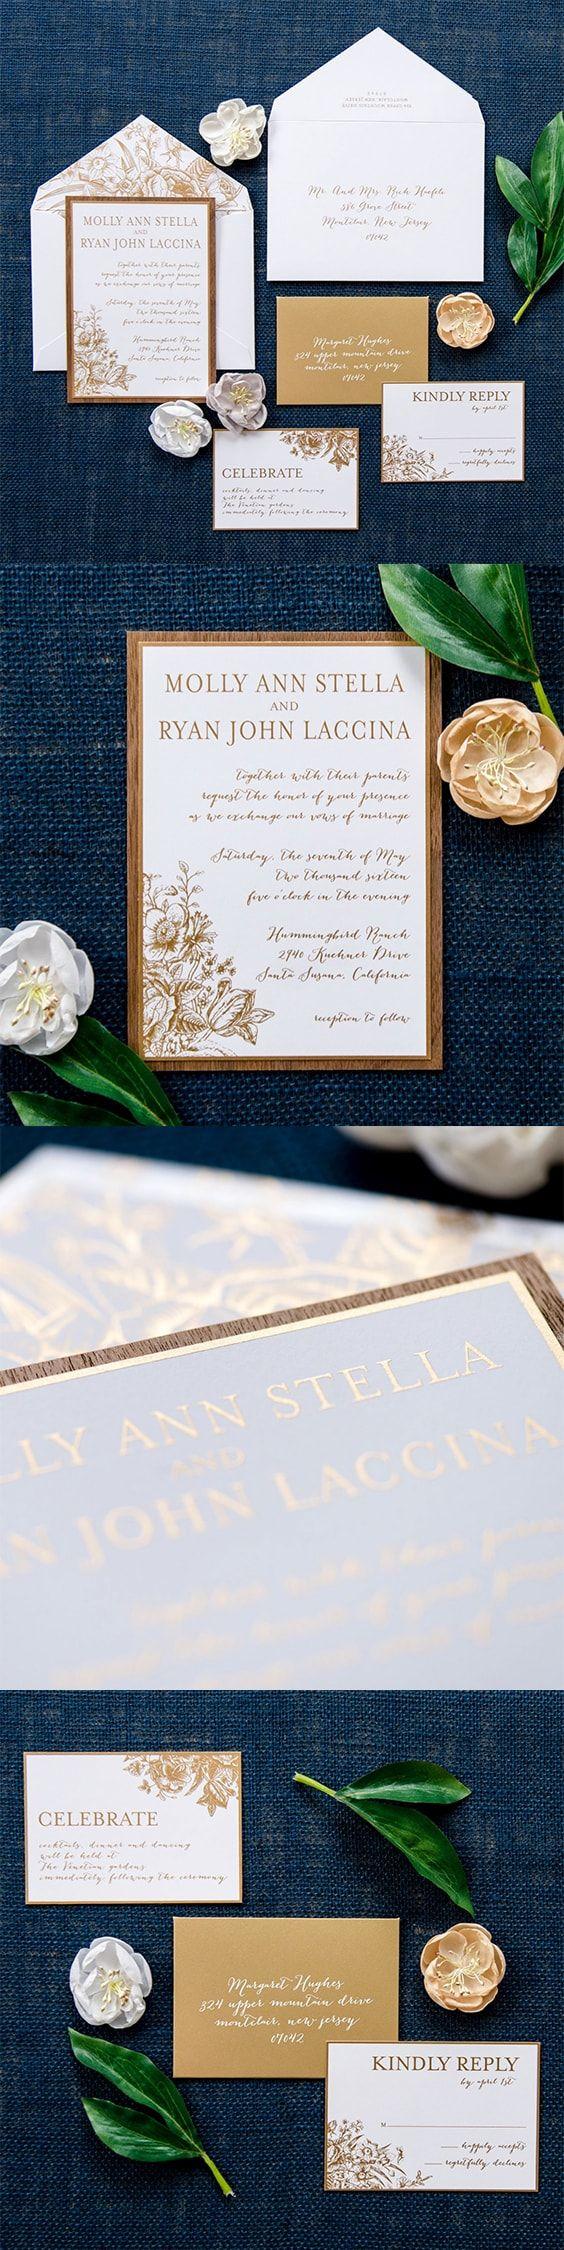 759 Best Vintage Wedding Ideas Images On Pinterest Retro Weddings